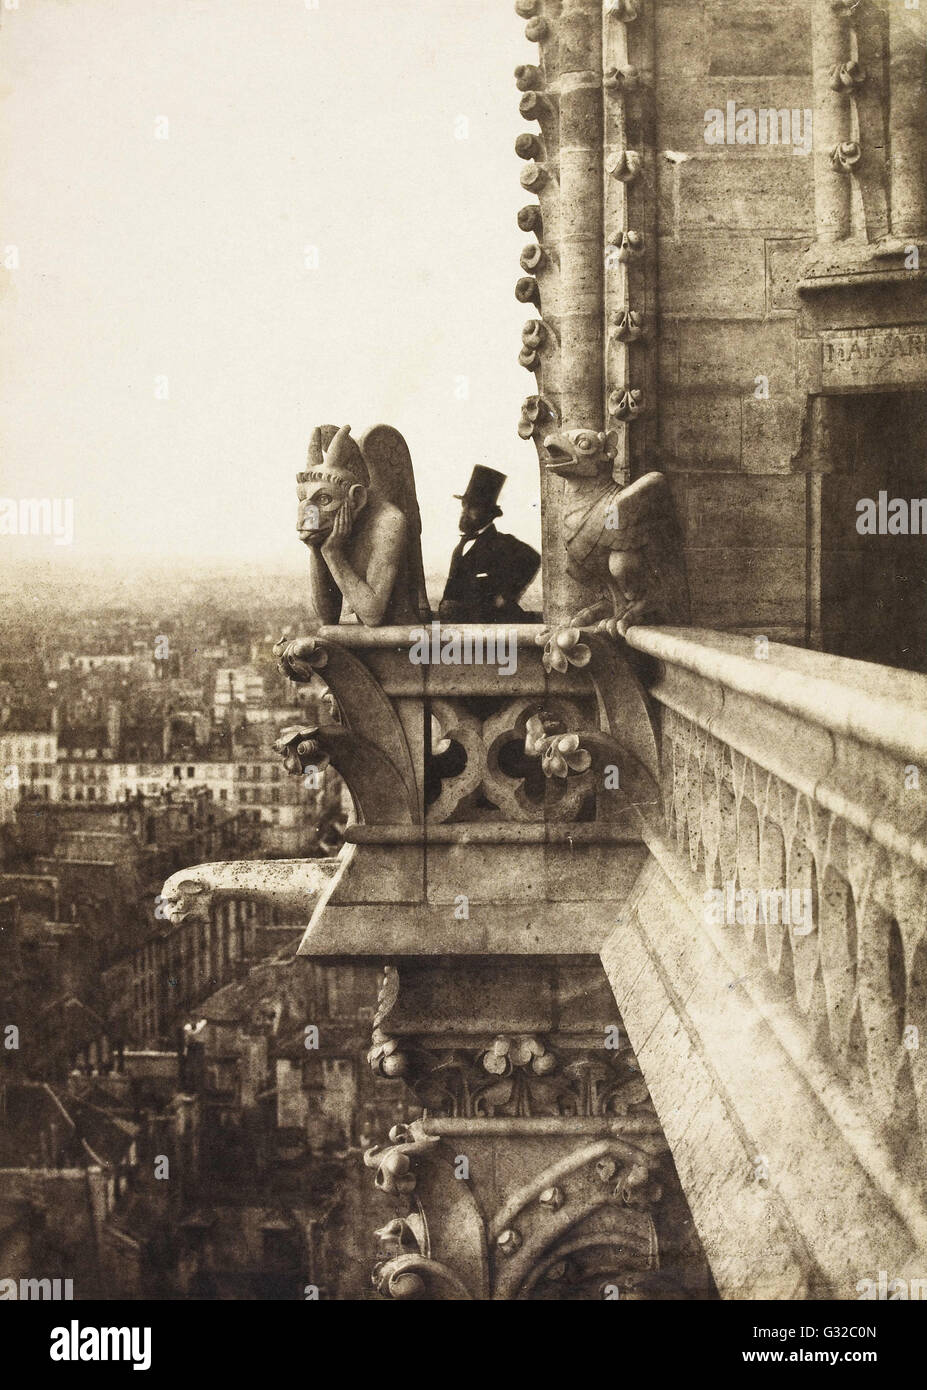 Charles Nègre - Il Vampiro - Musée d'Orsay, Parigi Immagini Stock